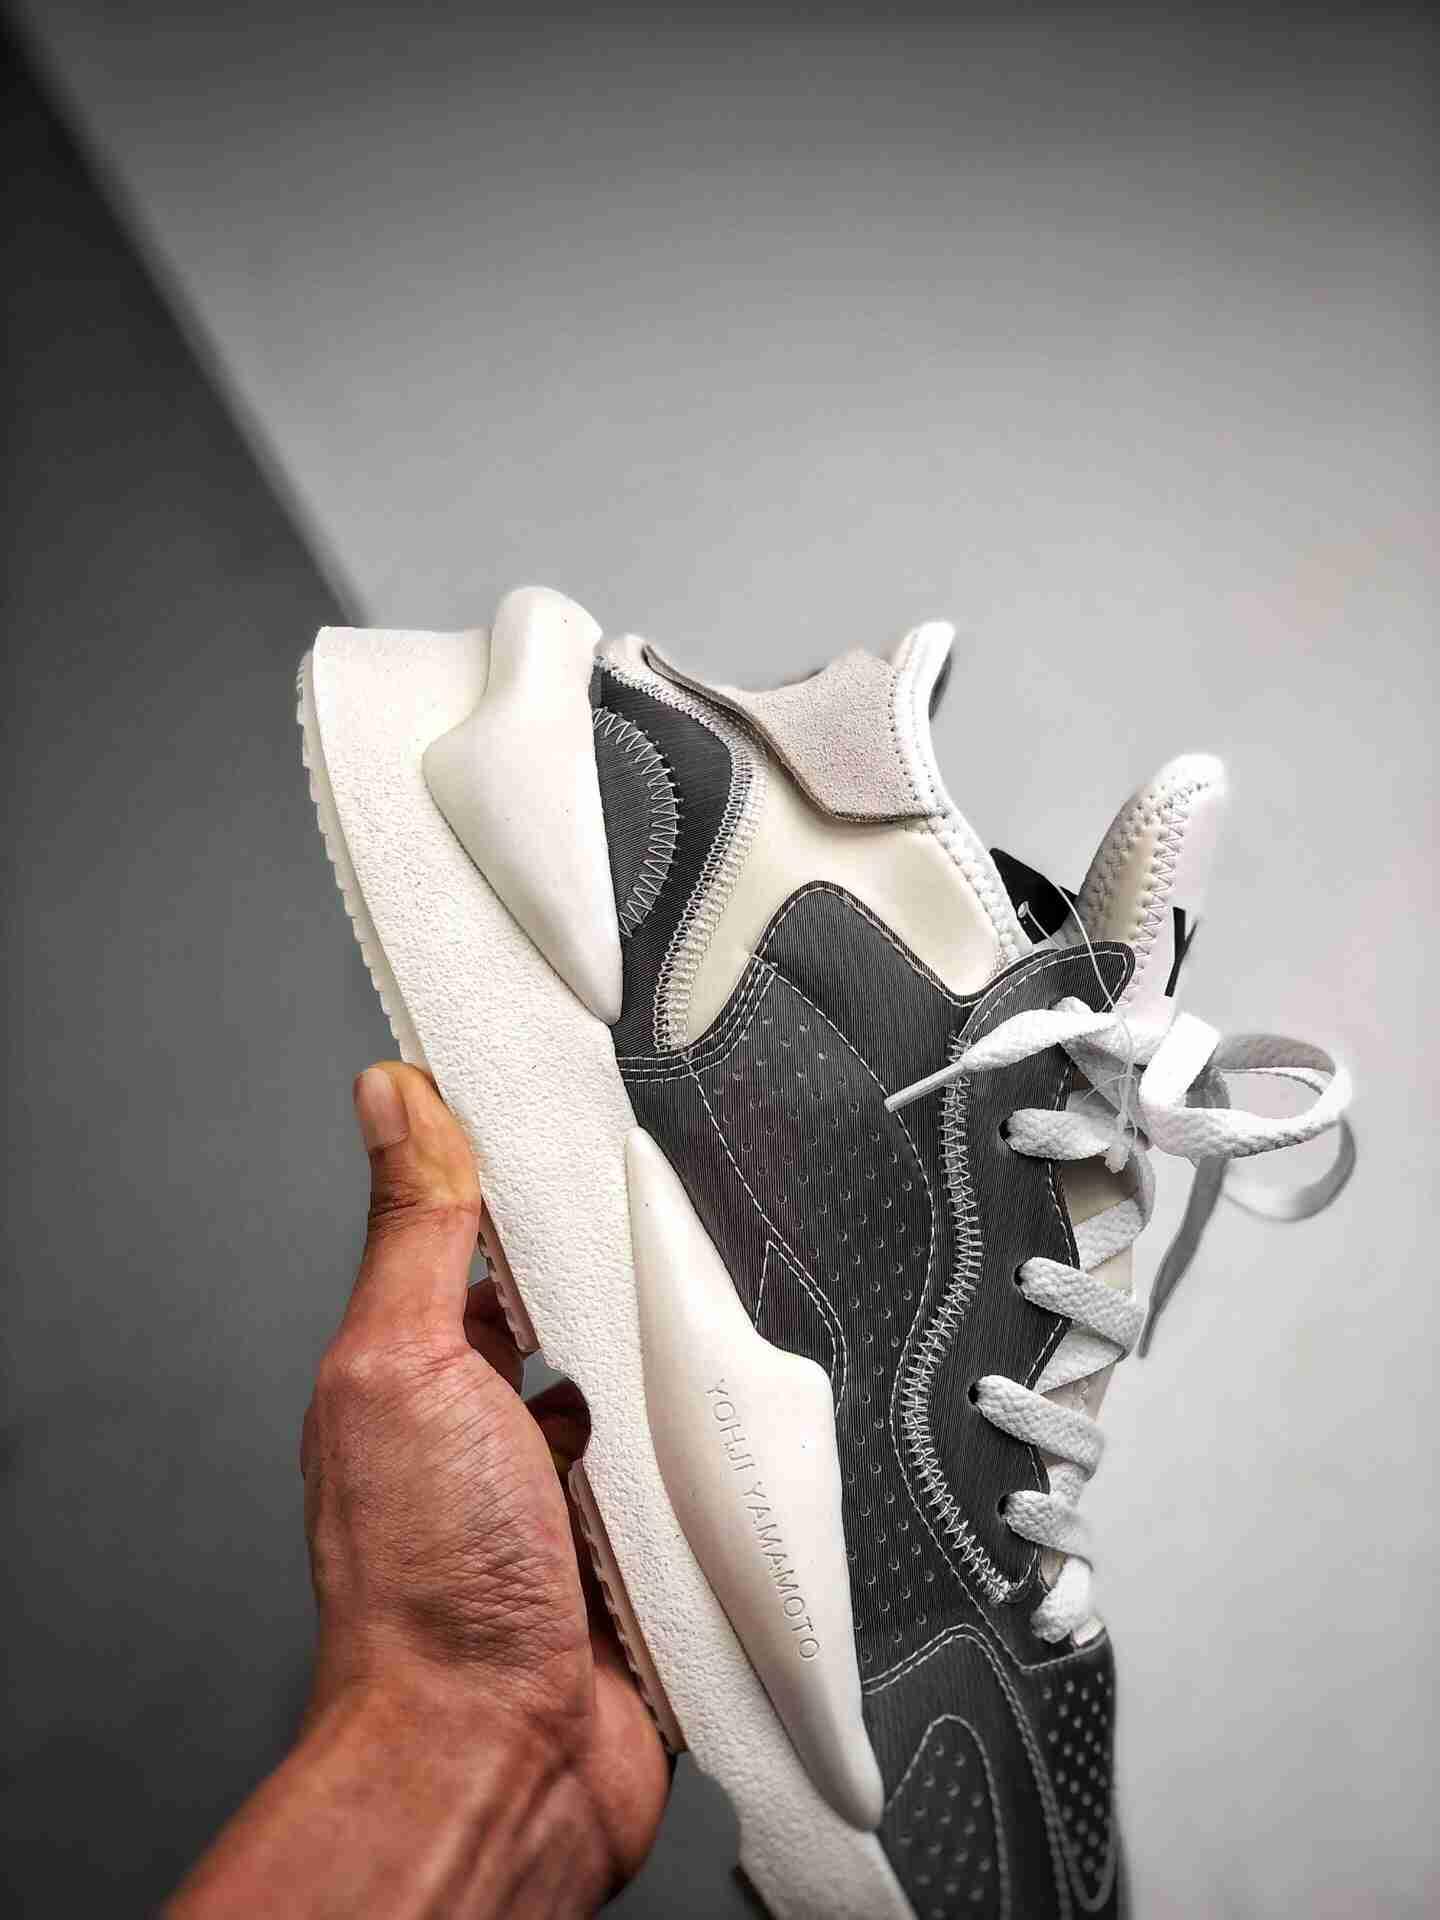 Adidas Y-3 Kaiwa Chunky Sneakers 凯瓦系列